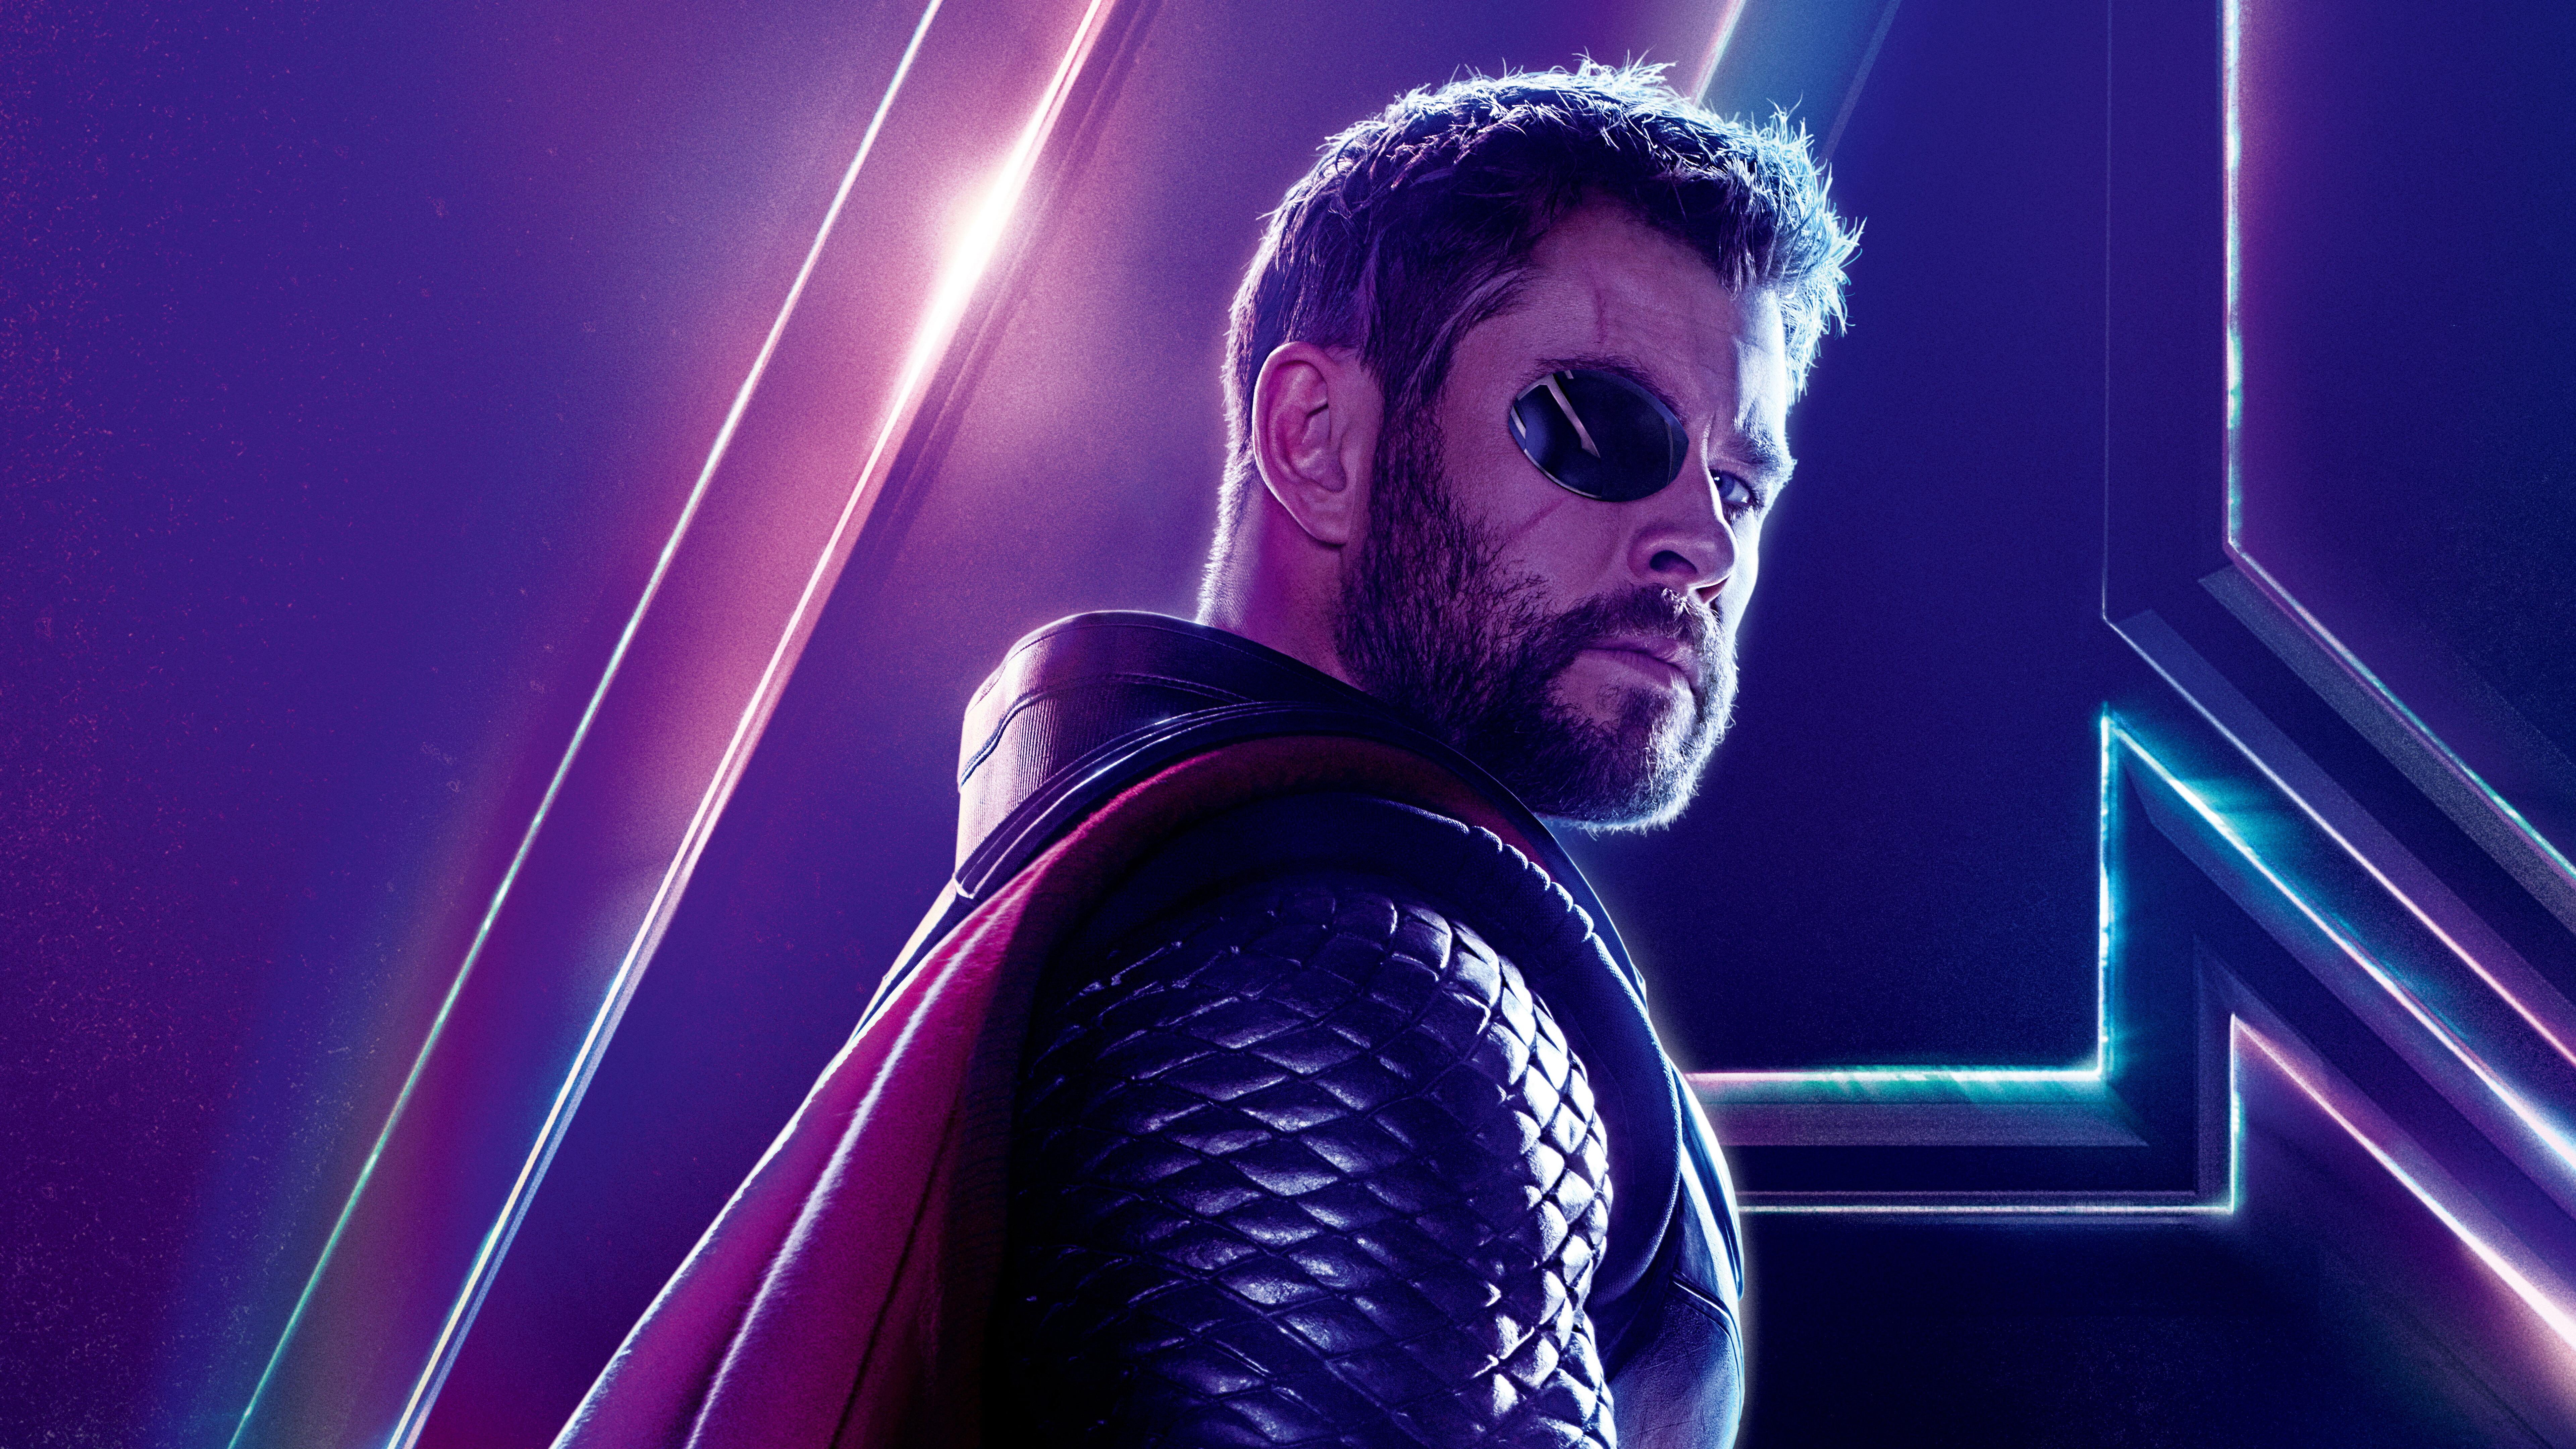 7680x4320 Thor In Avengers Infinity War New 8k Poster 8k Hd 4k